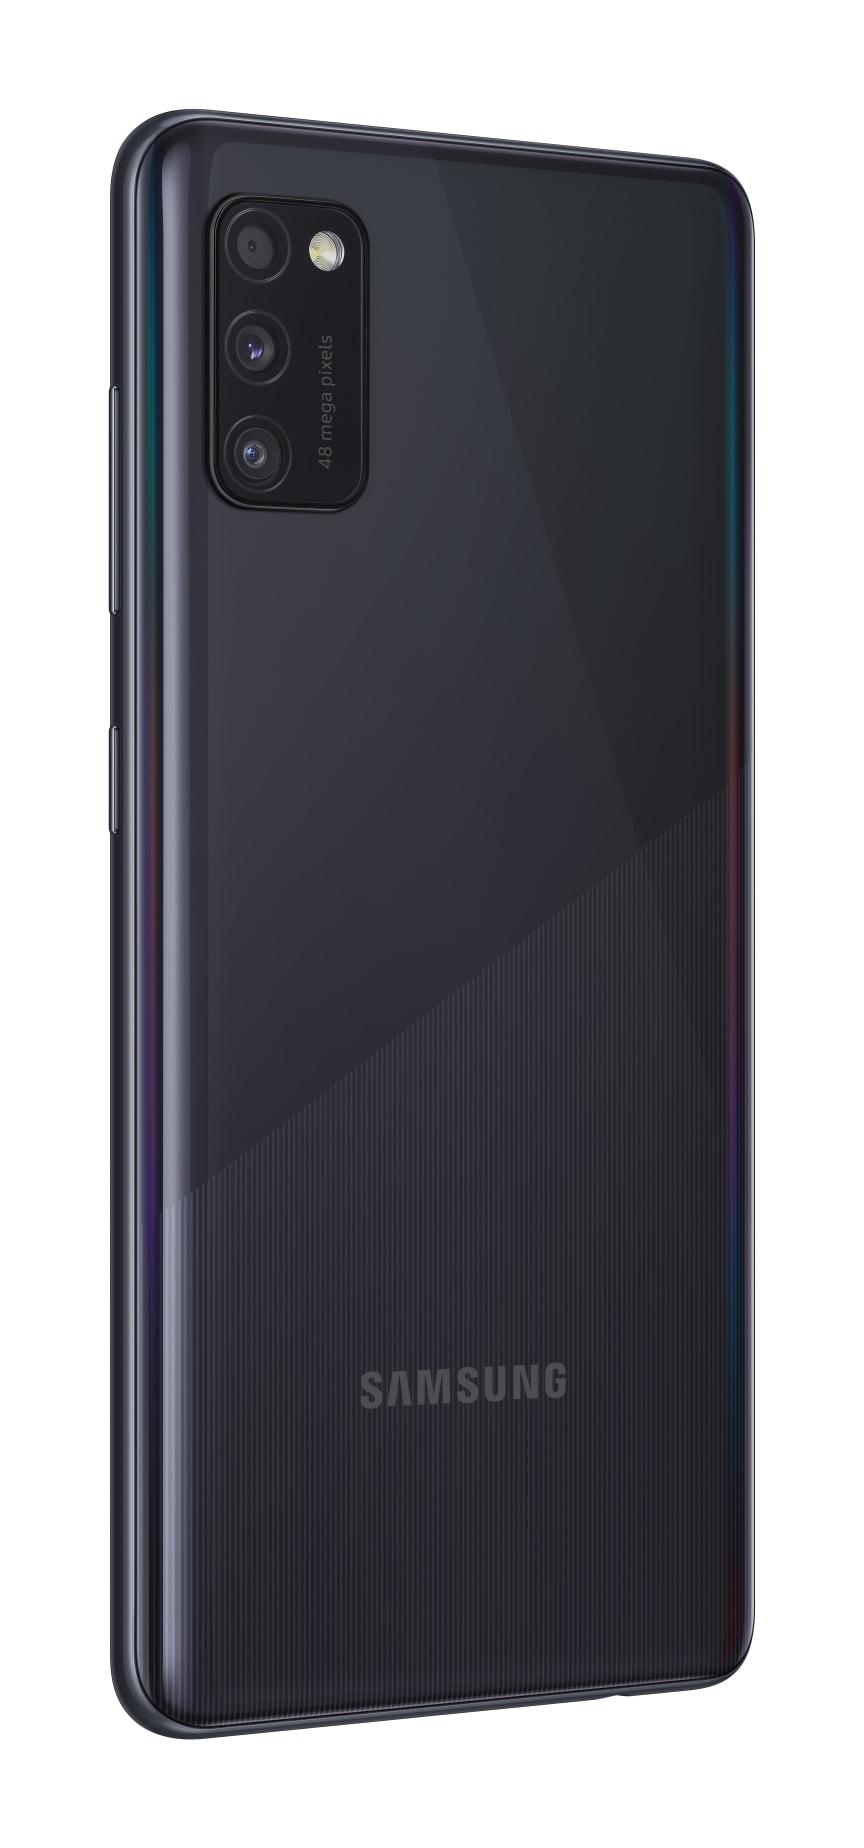 03_Samsung Galaxy A41_prism_crush_black_l30